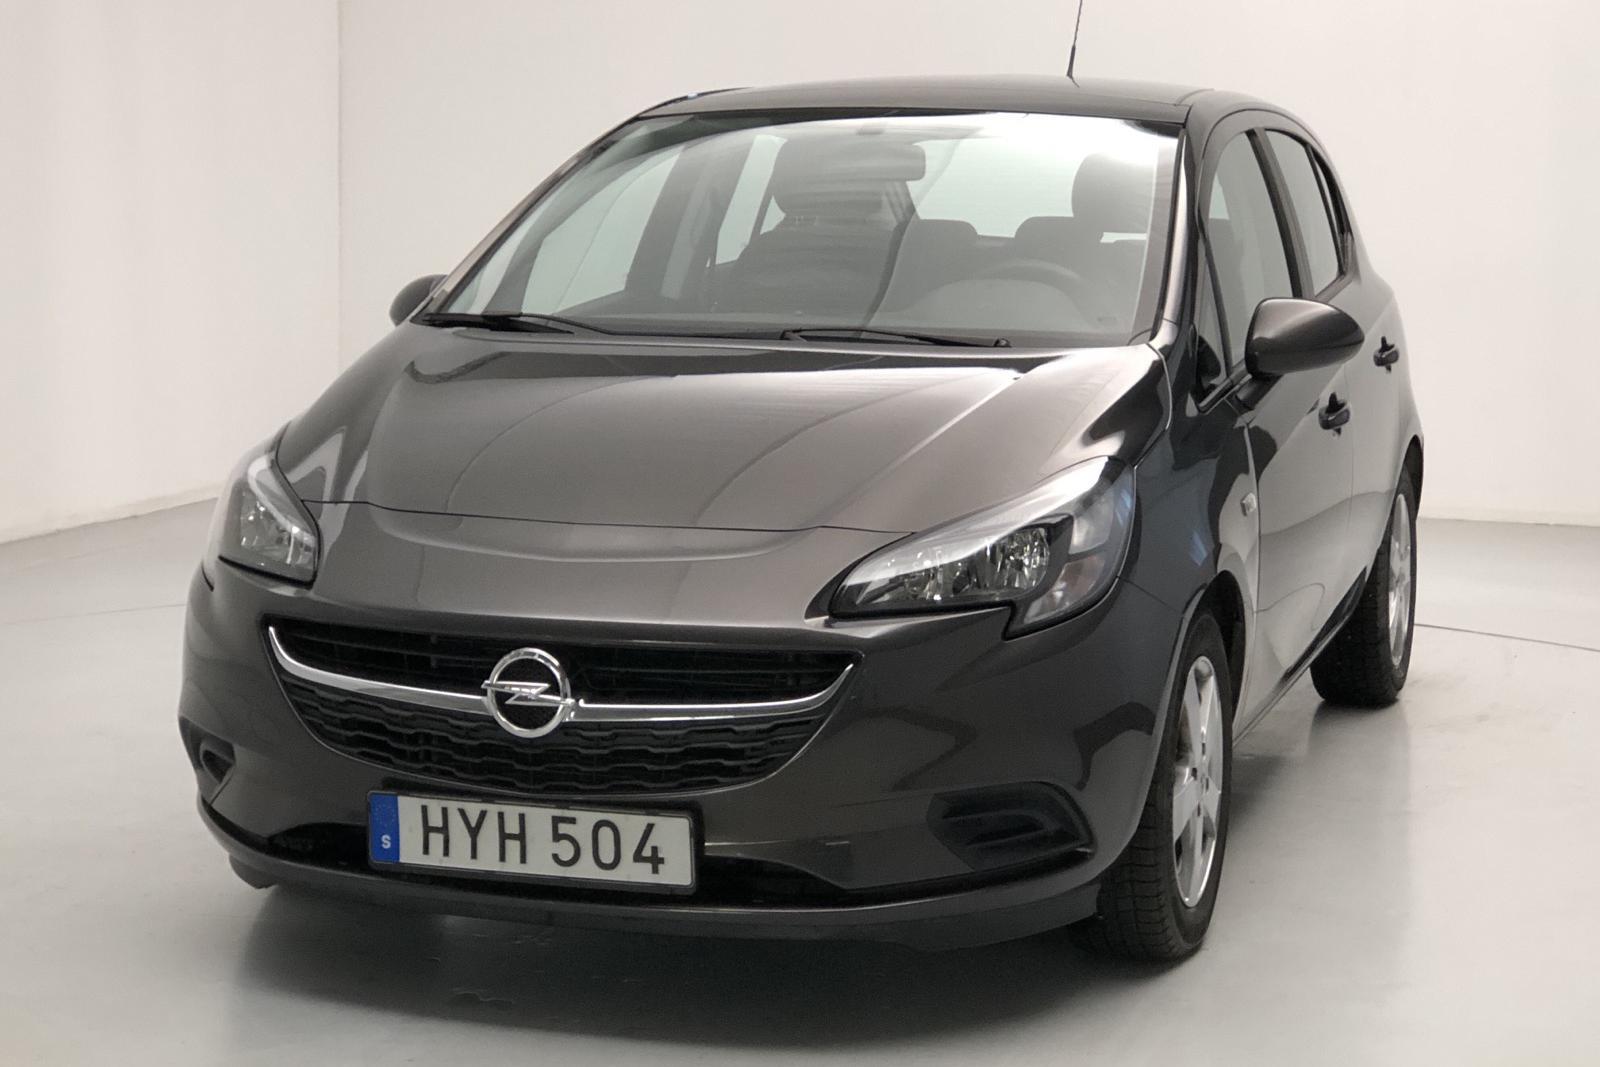 Opel Corsa 1.4 ECOTEC 5dr (90hk) - 41 000 km - gray - 2015